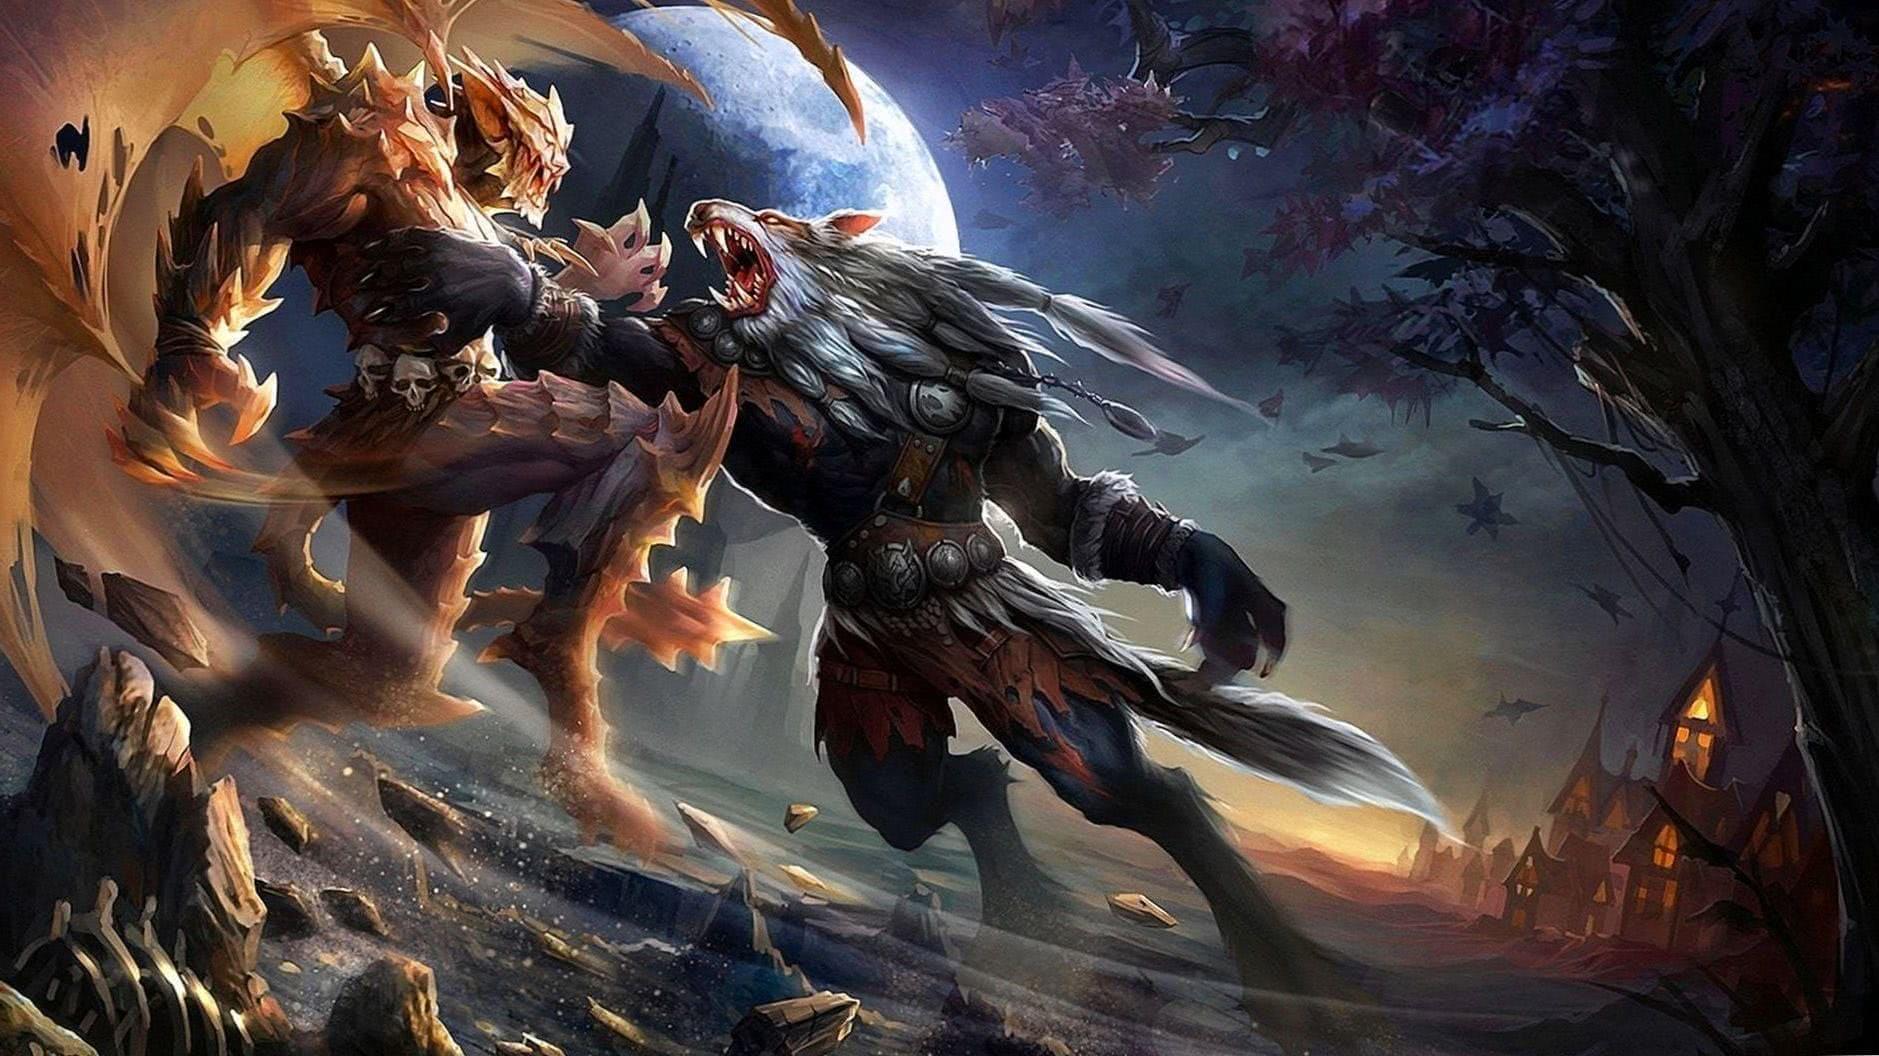 Vampire Werewolf HD Wallpaper